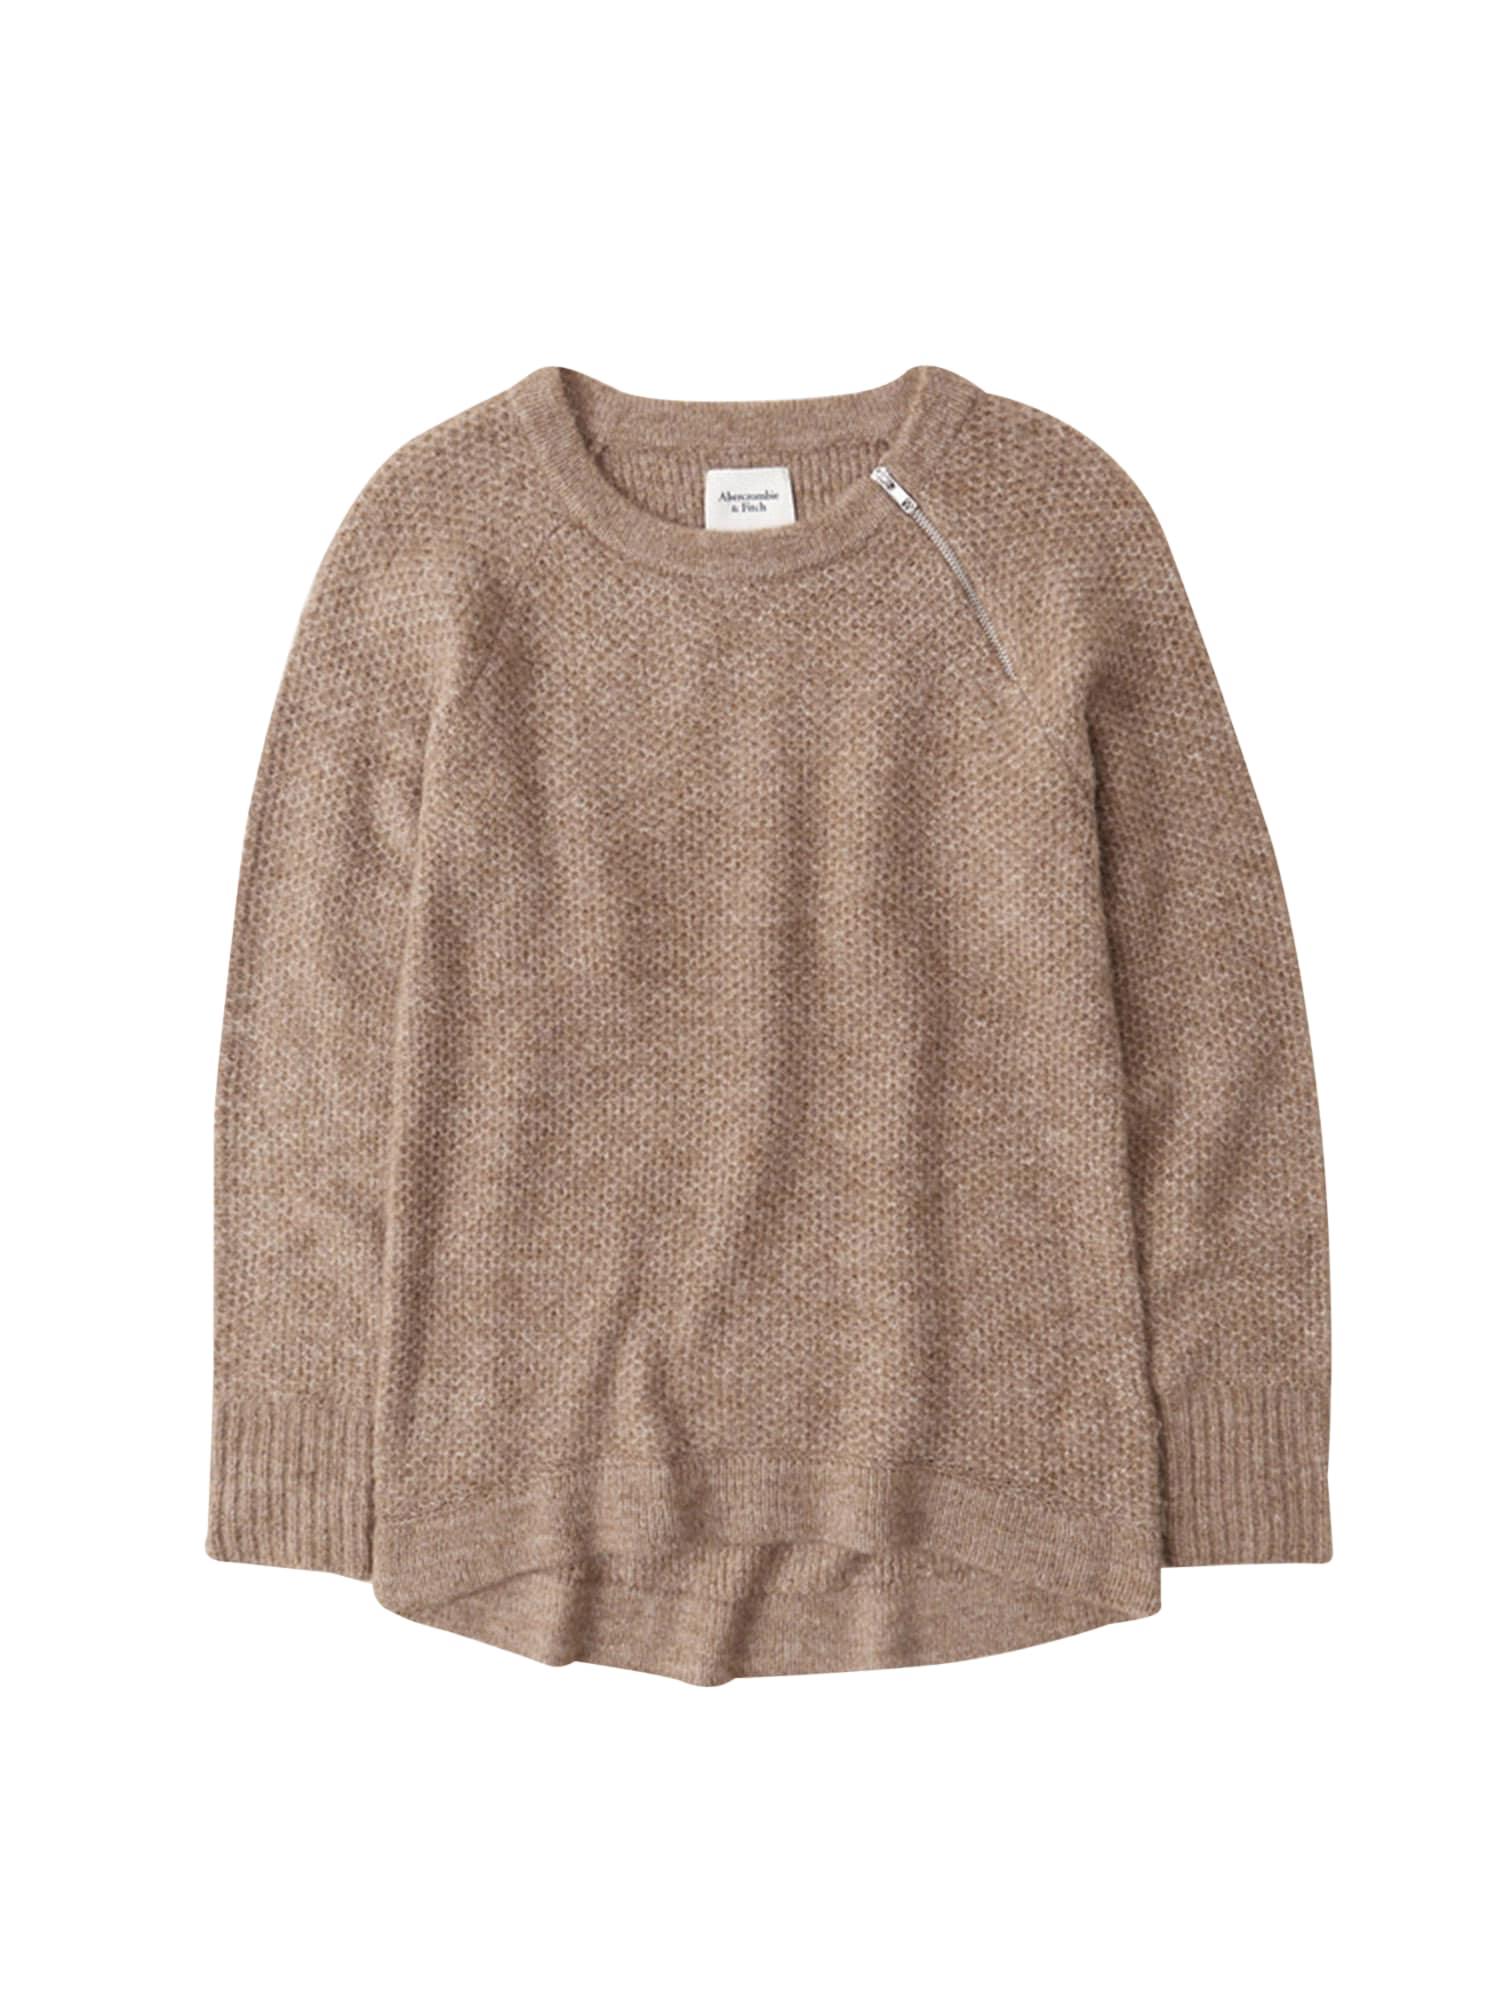 Abercrombie & Fitch Megztinis margai ruda